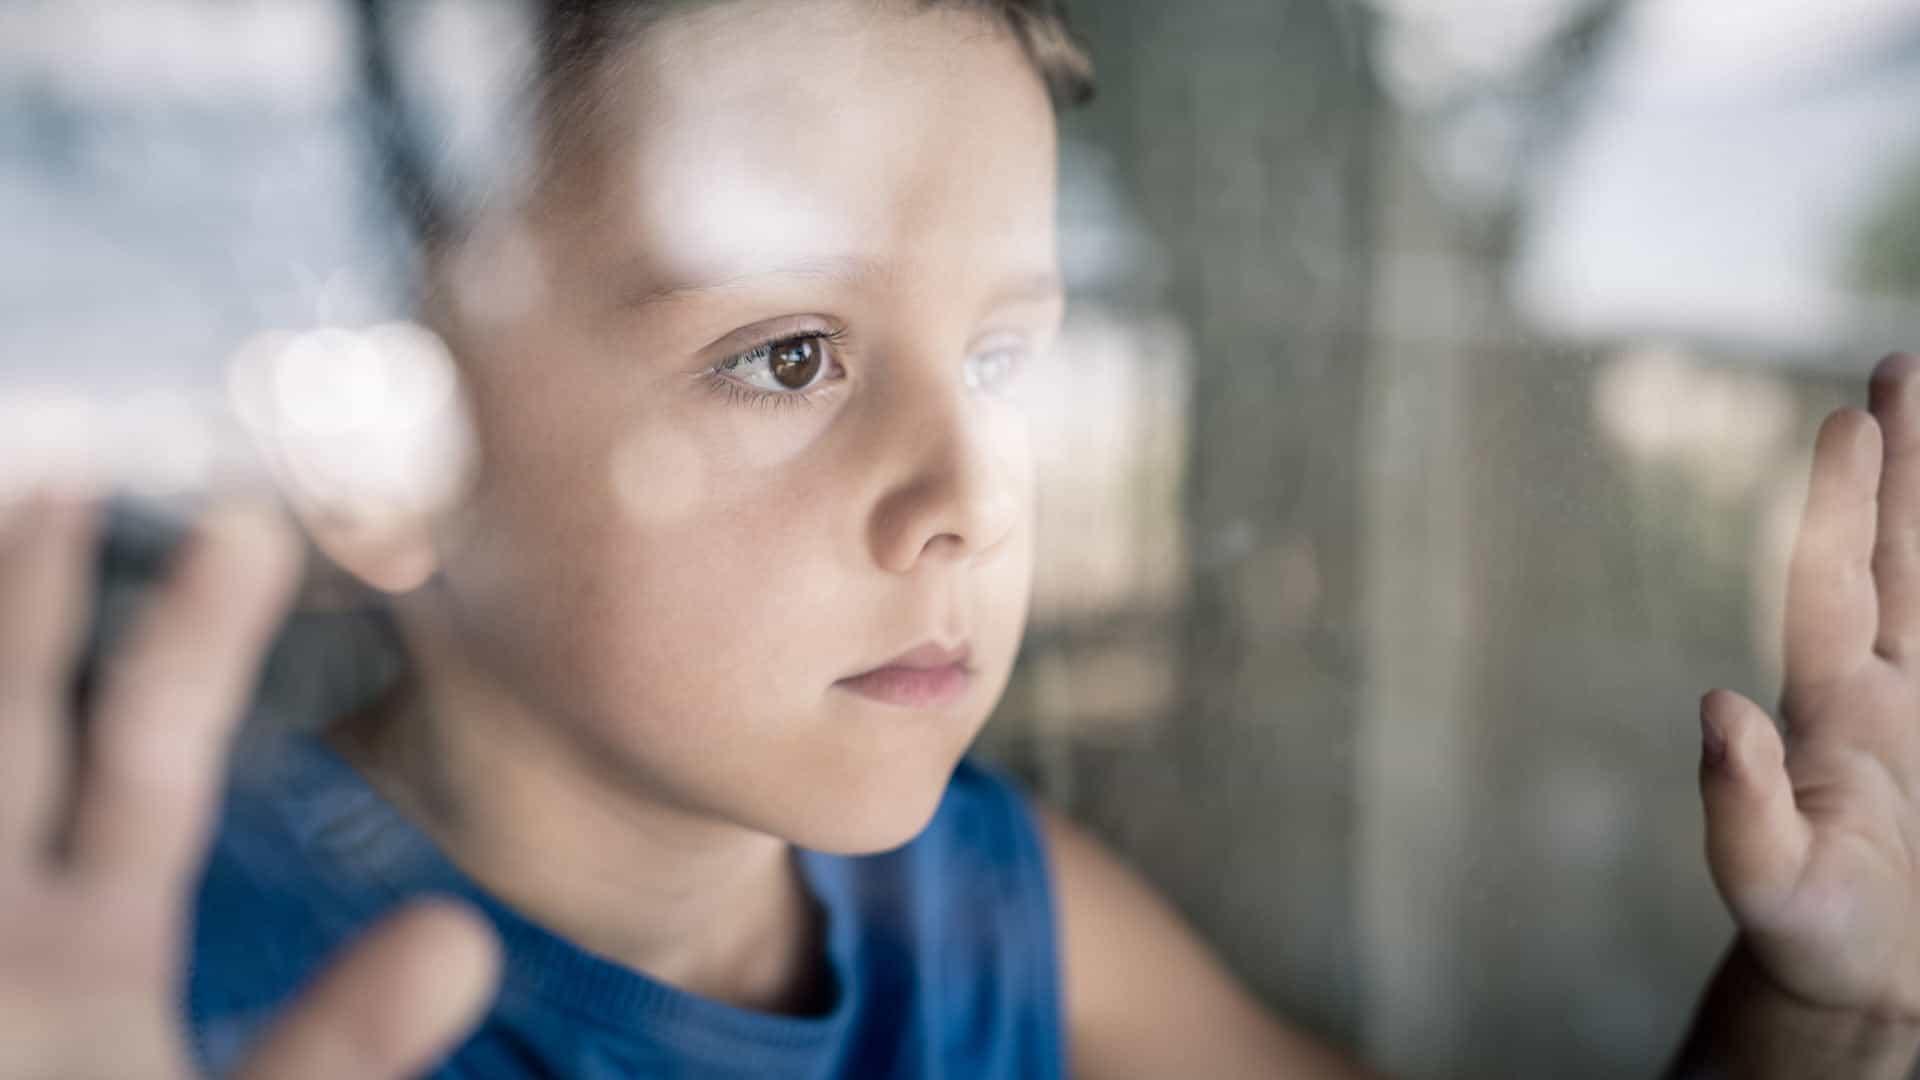 Missing Child Investigations